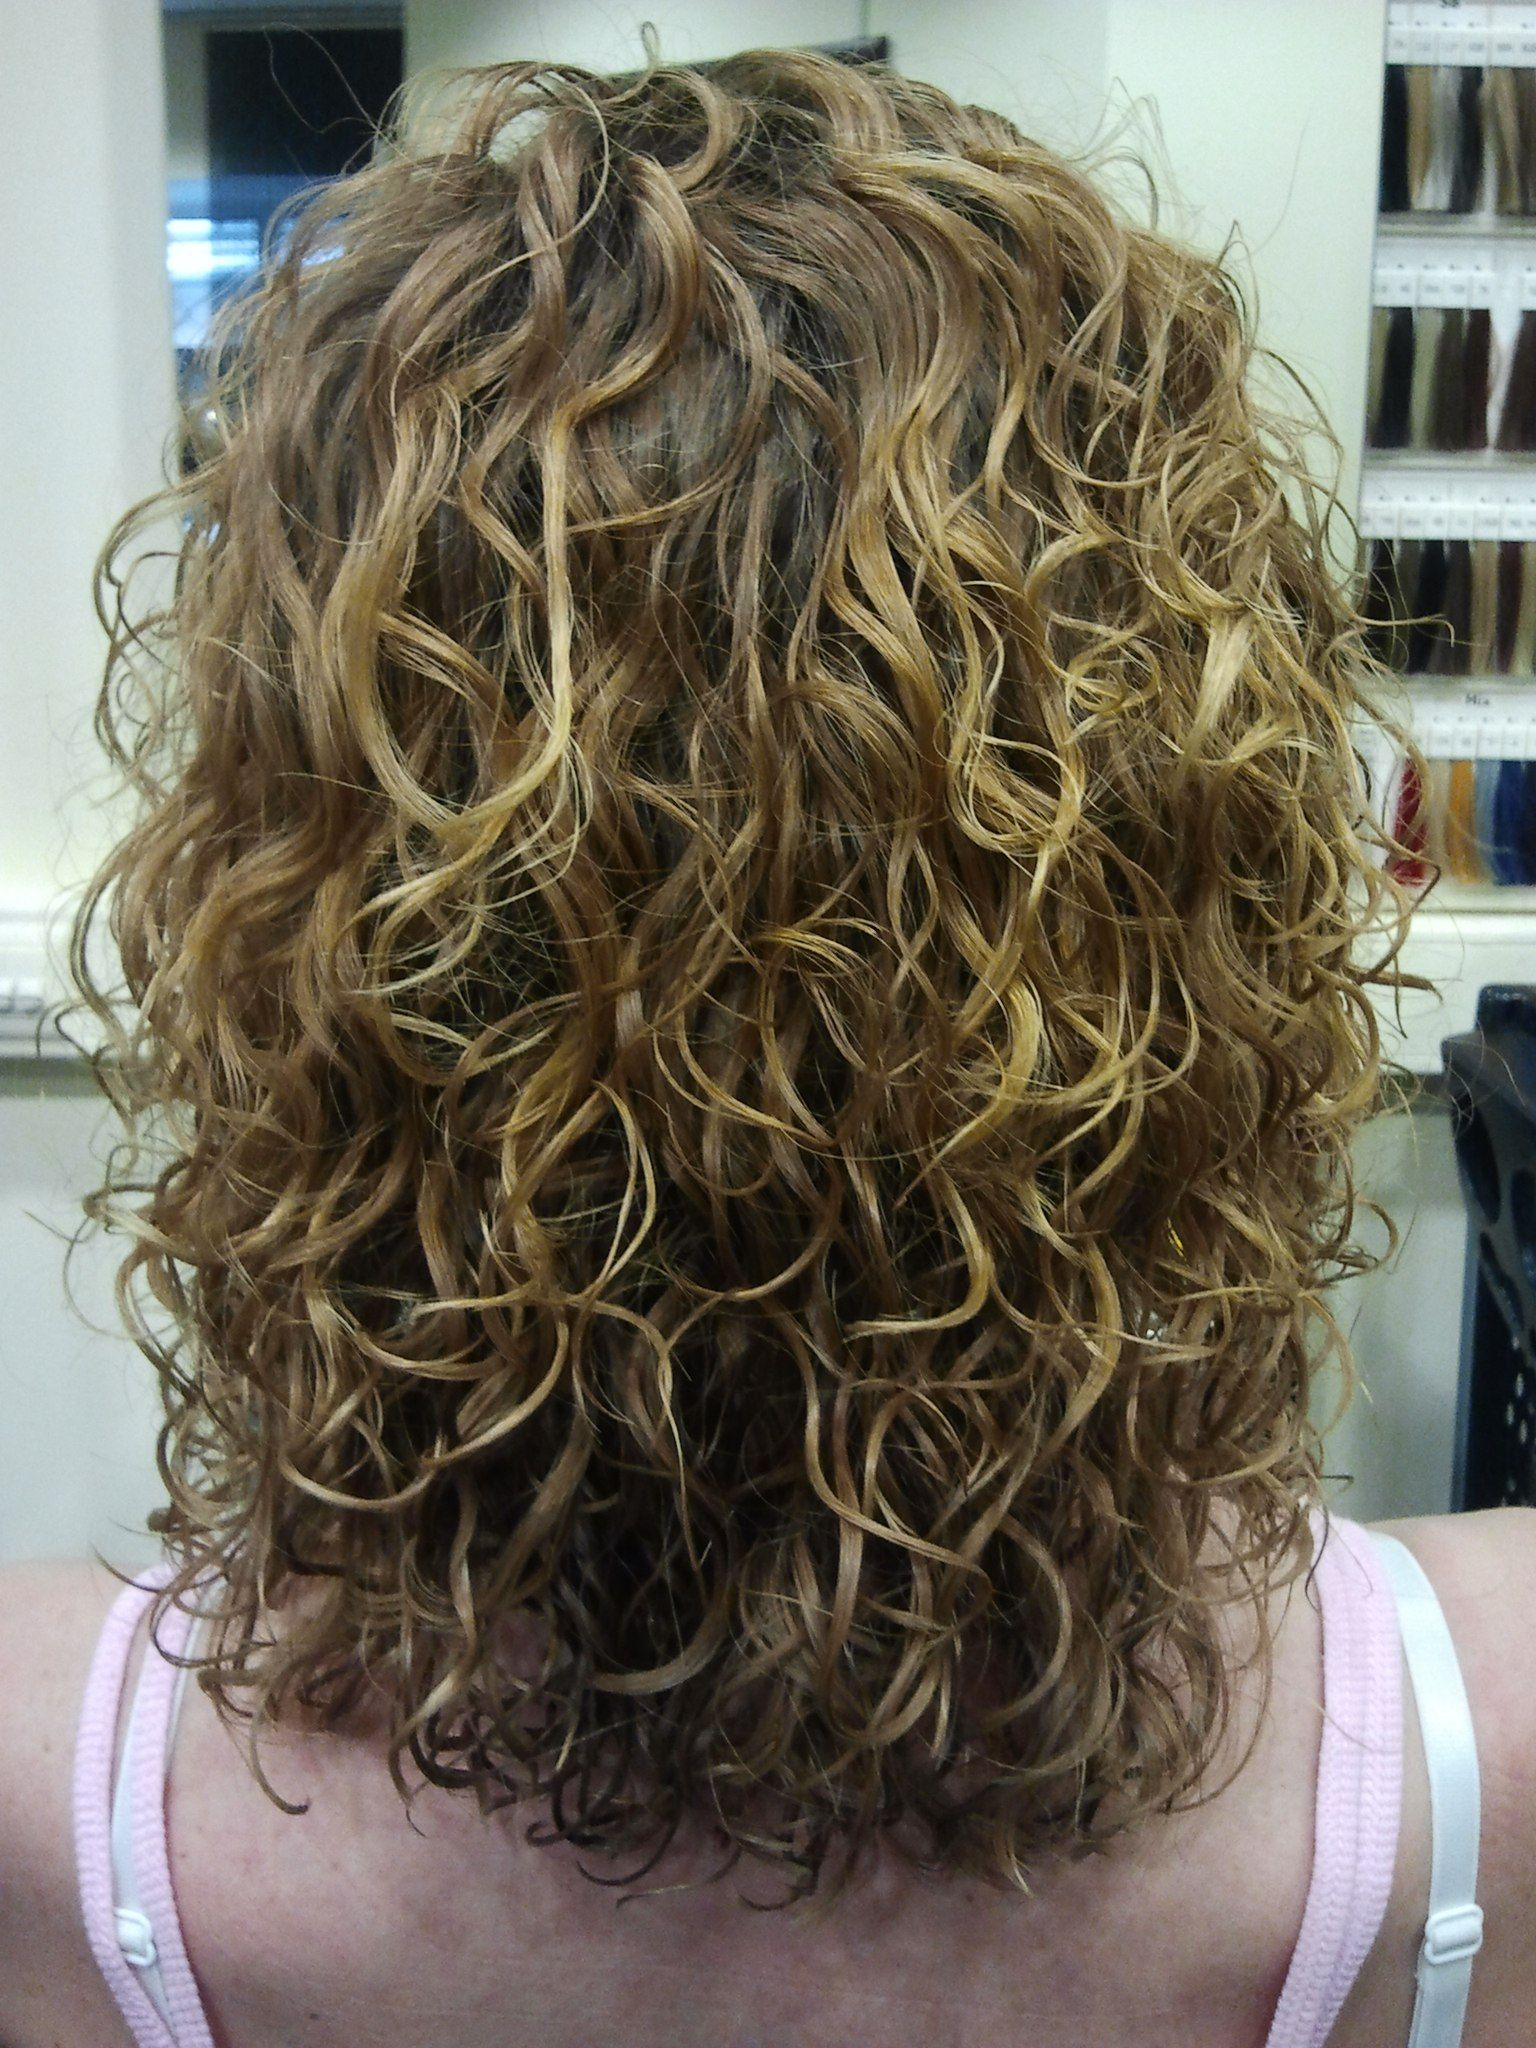 Big Curls Highlights Medium Length Medium Hair Styles Short Permed Hair Permed Hairstyles